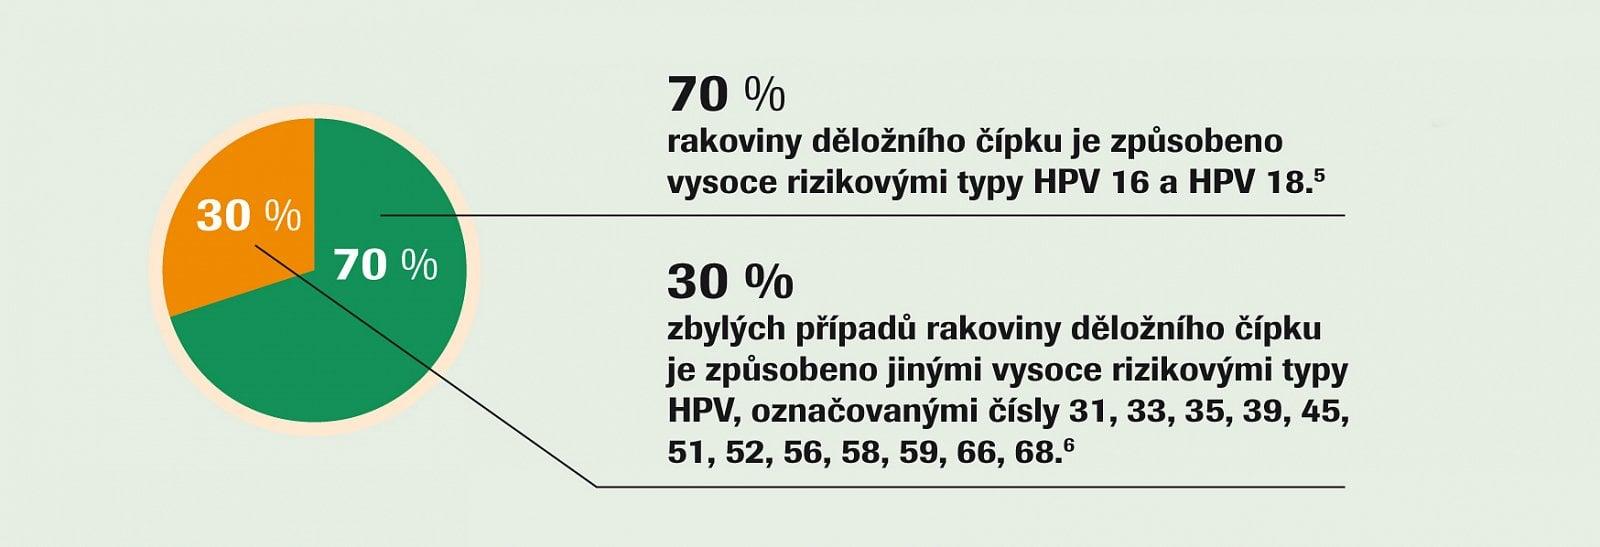 Ockovani papillomavirus chlapci. Ockovani hpv u chlapcu